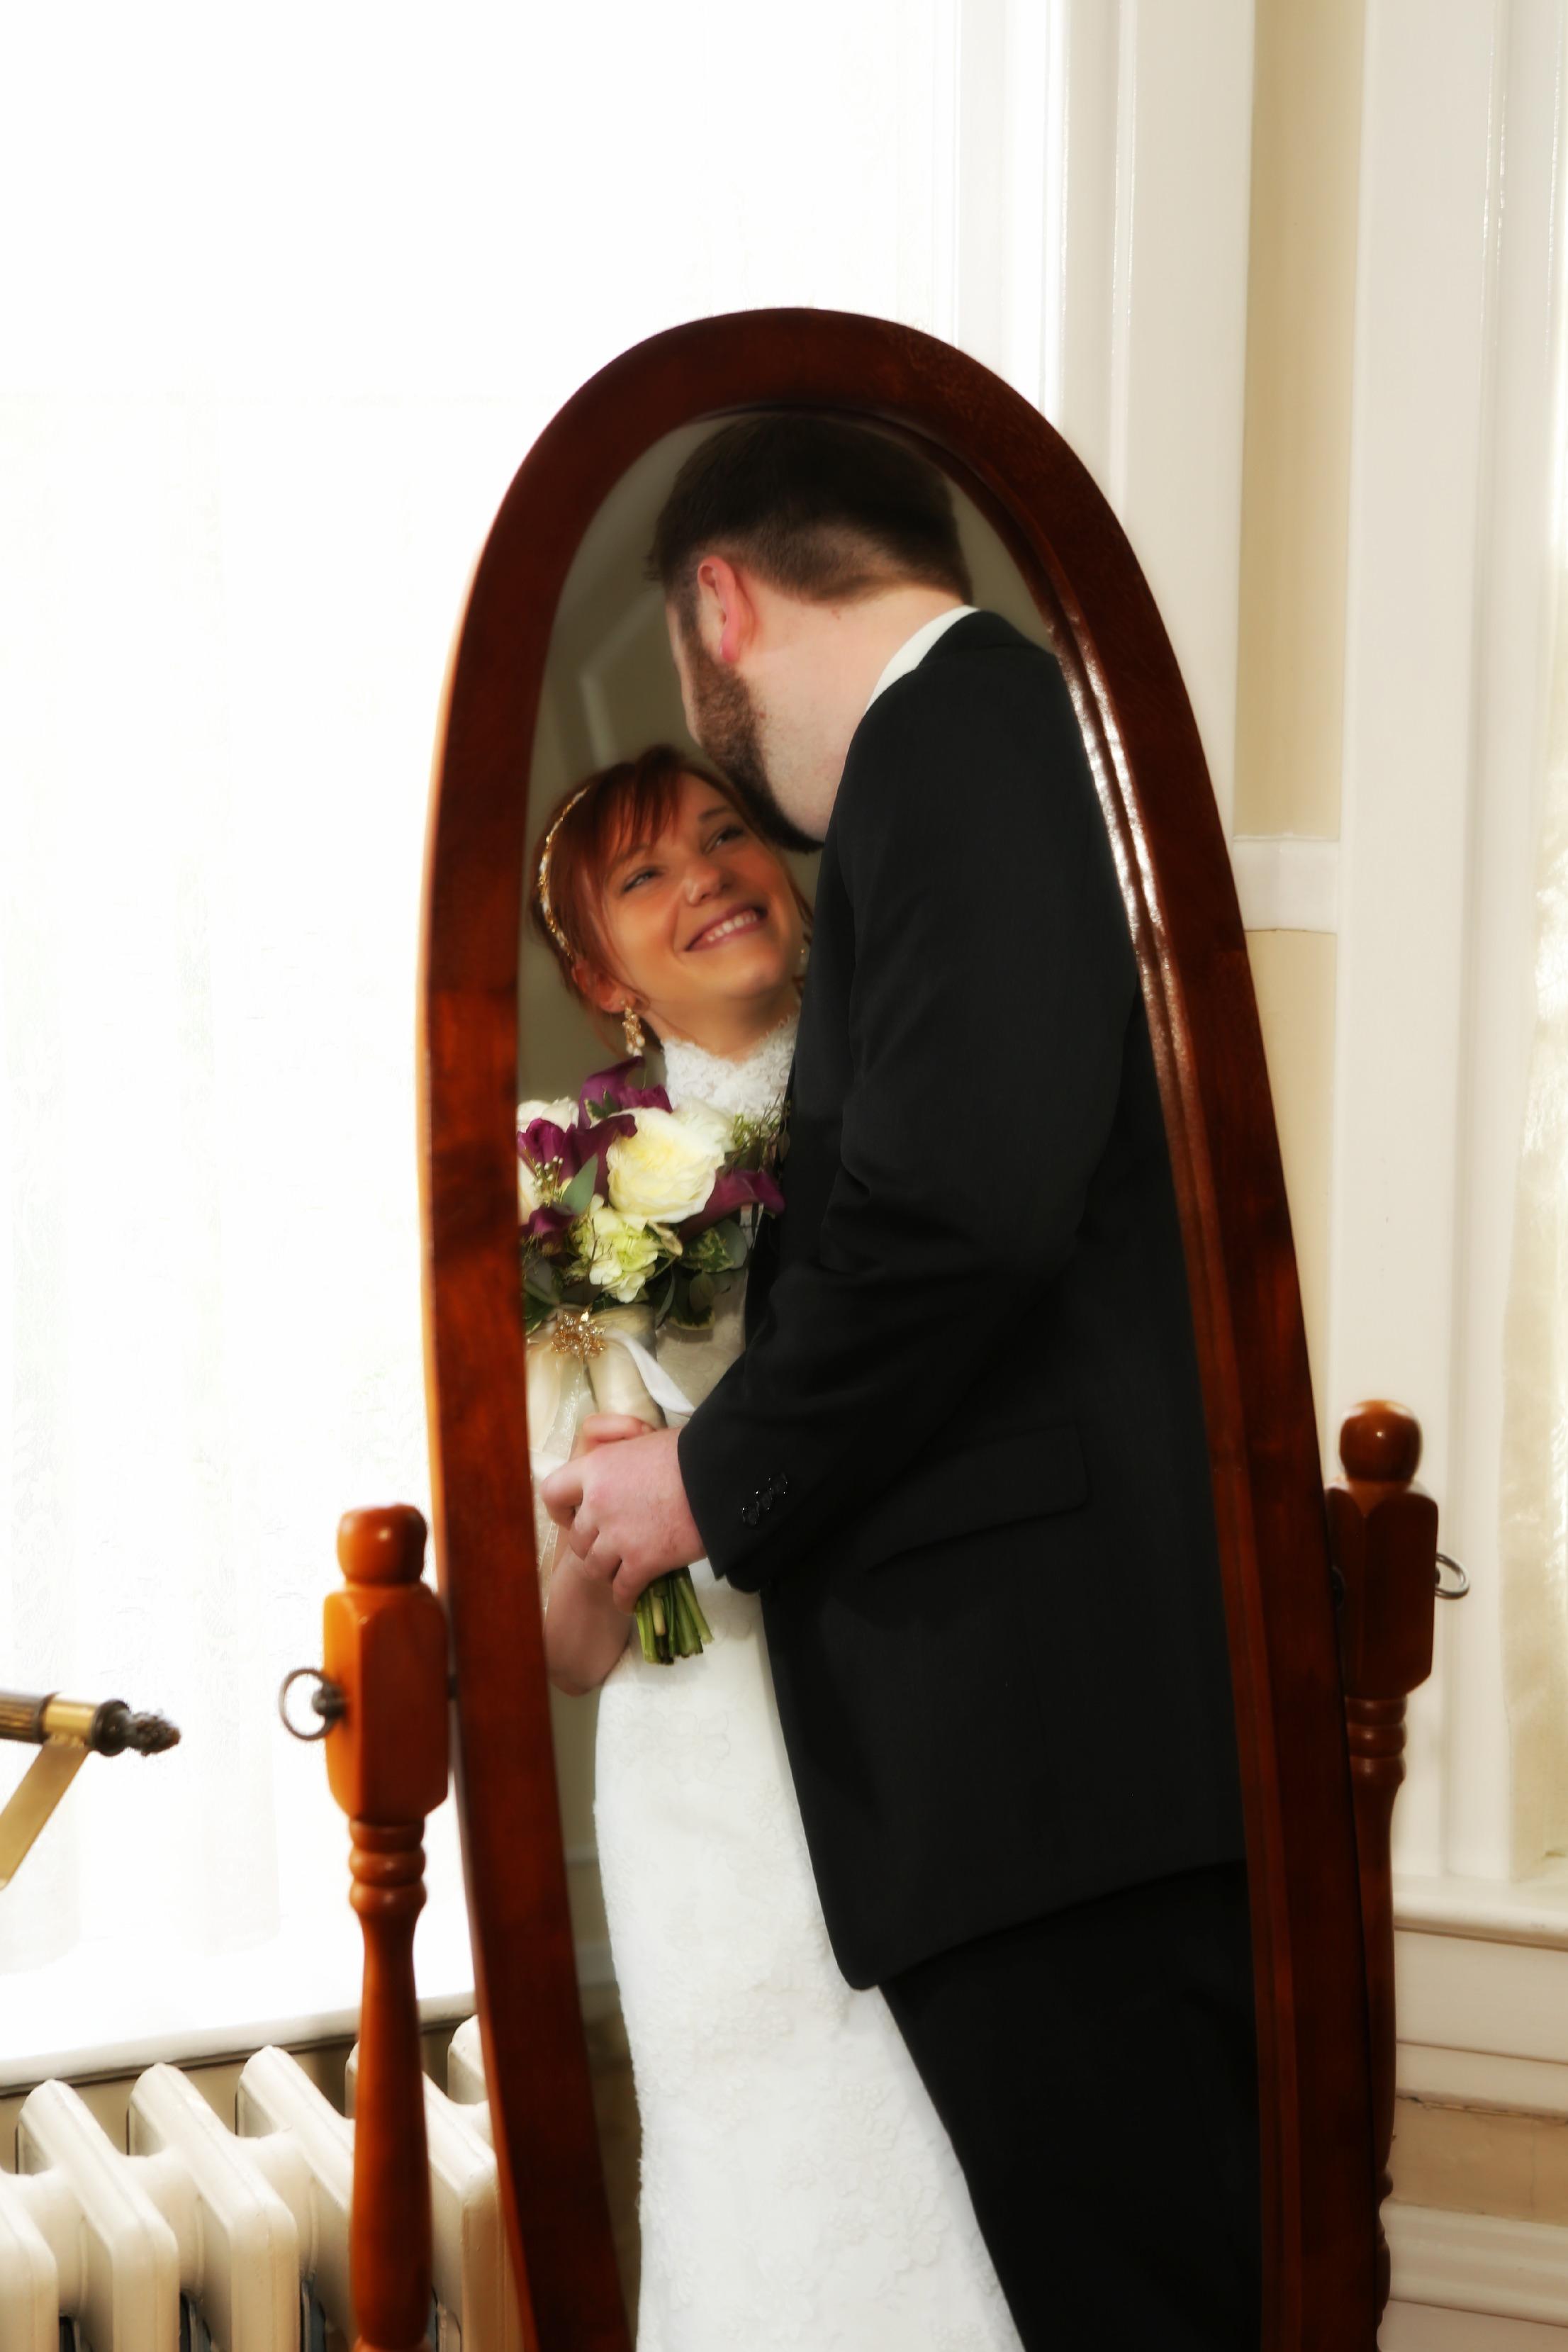 Wedding photography in Bountiful reception center